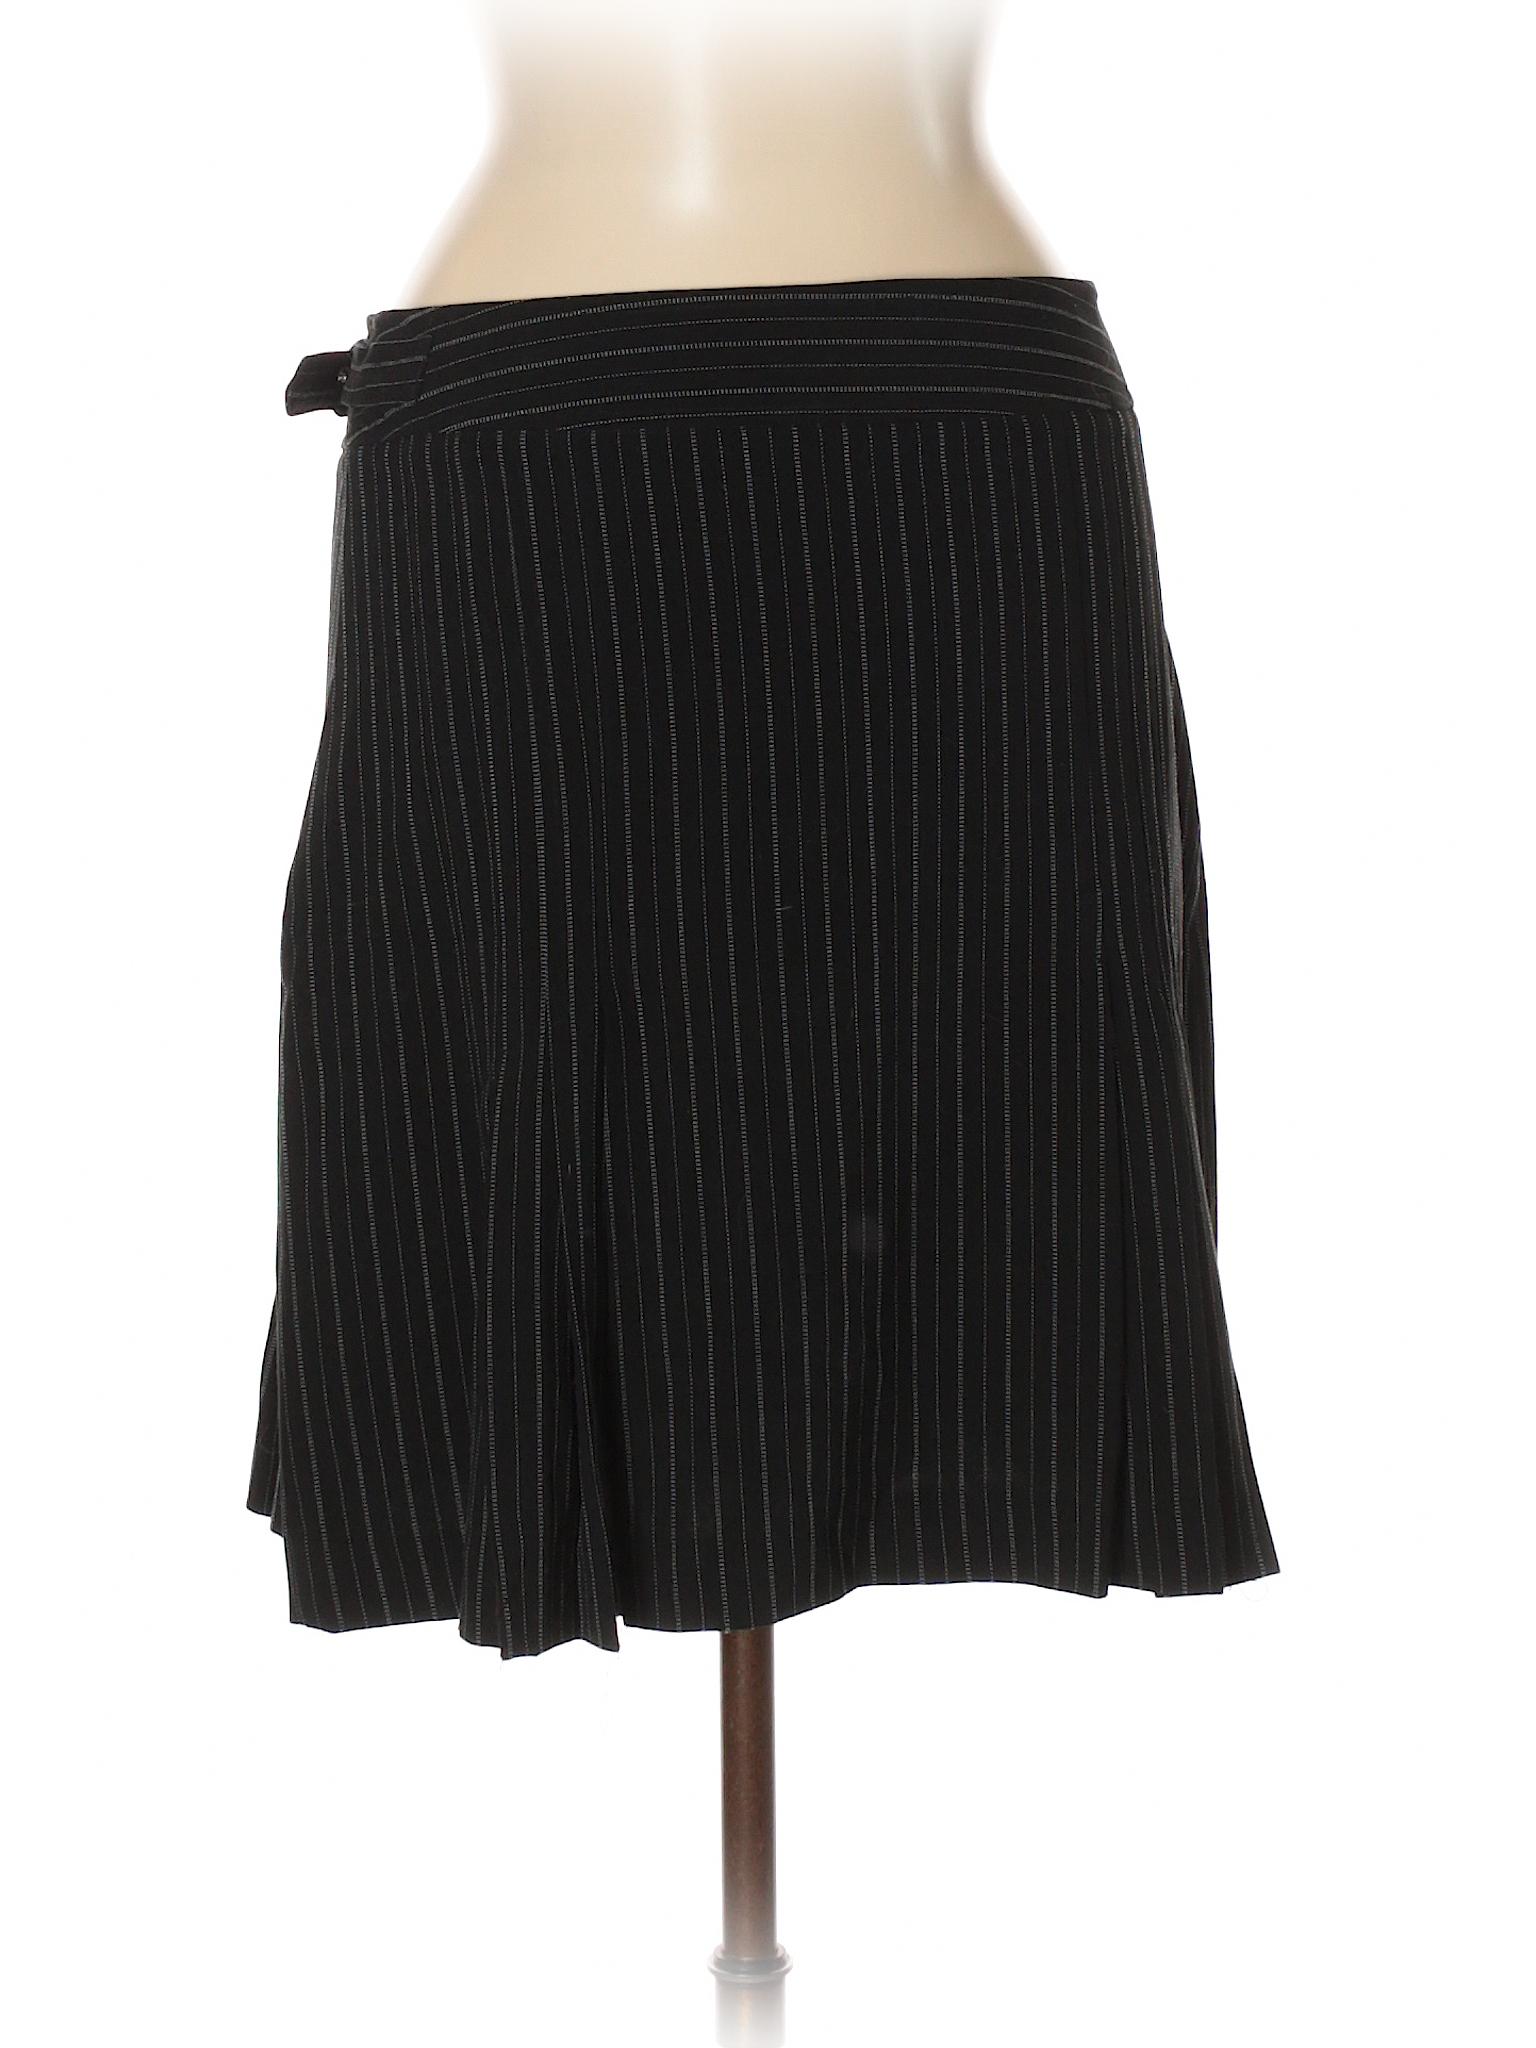 Boutique Skirt Skirt Boutique Skirt Boutique Casual Casual Boutique Casual UqxOw7x